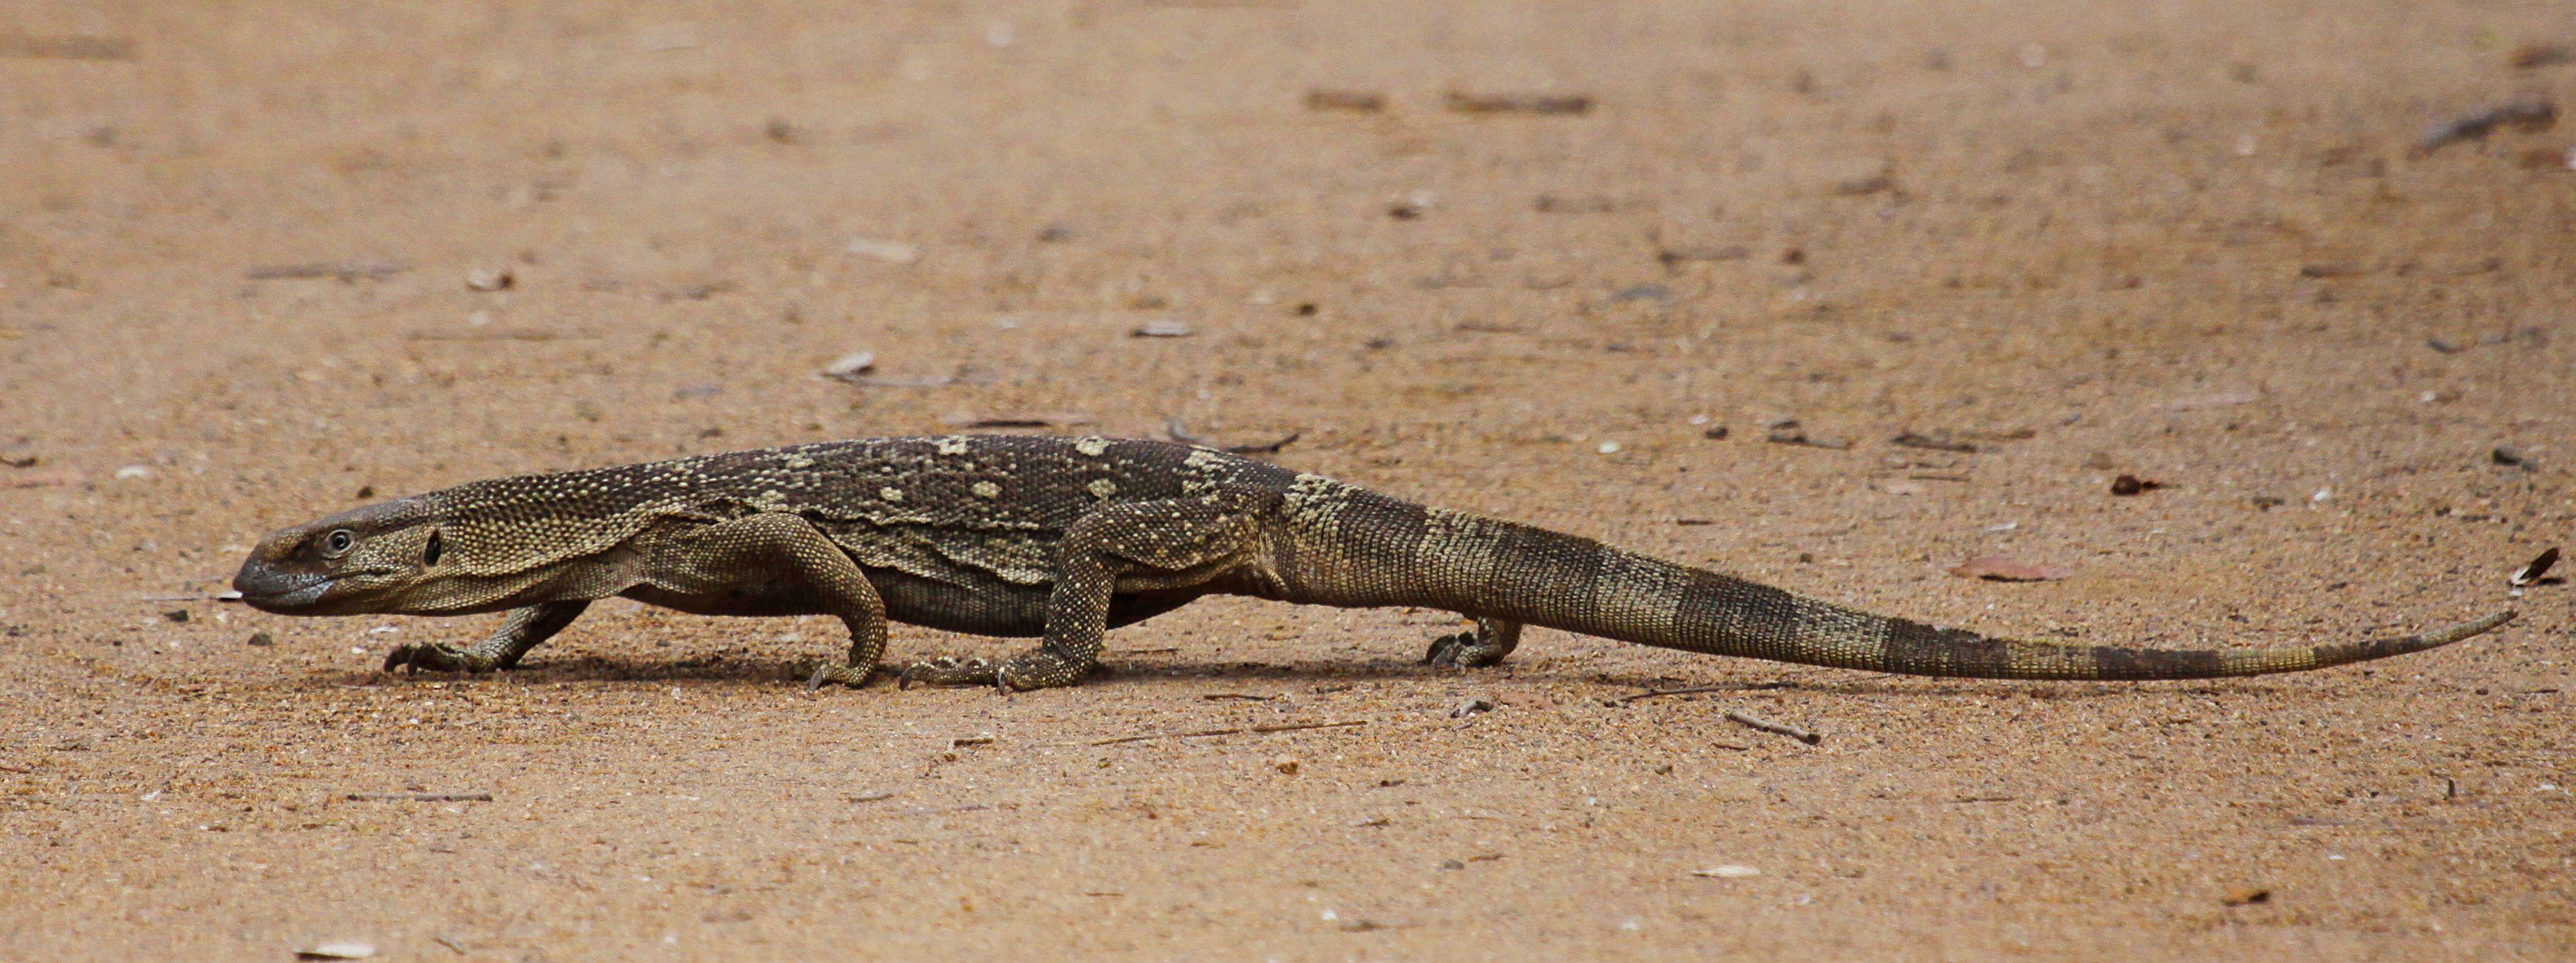 errestrial leguaan (monitor lizard) at Kruger Park